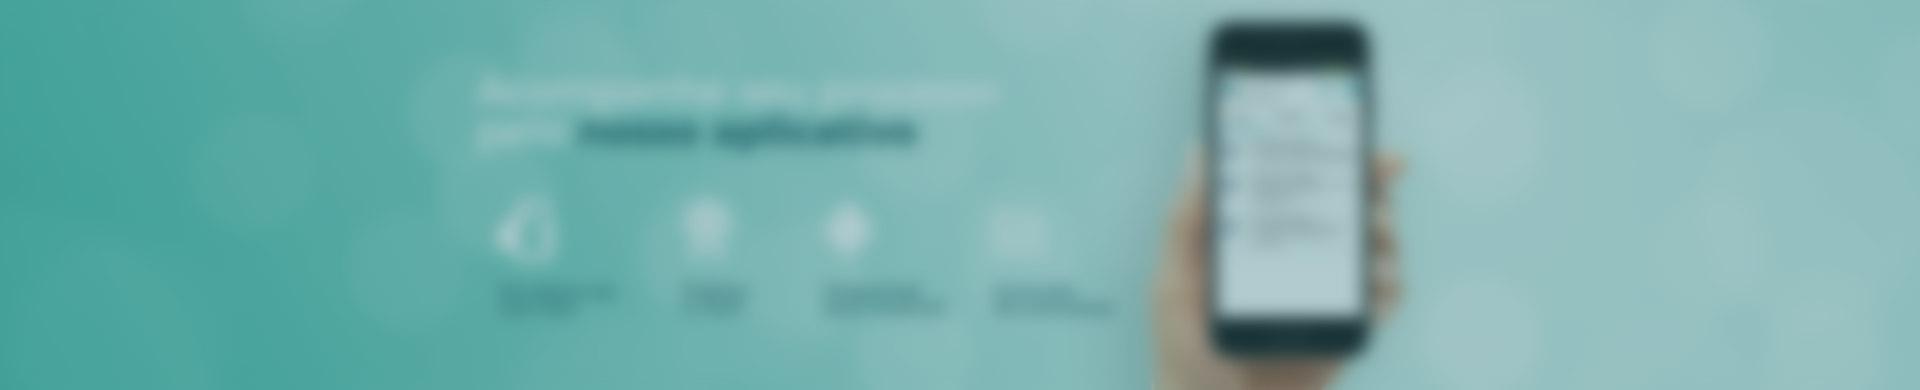 bg-banner-secundario-app-alt